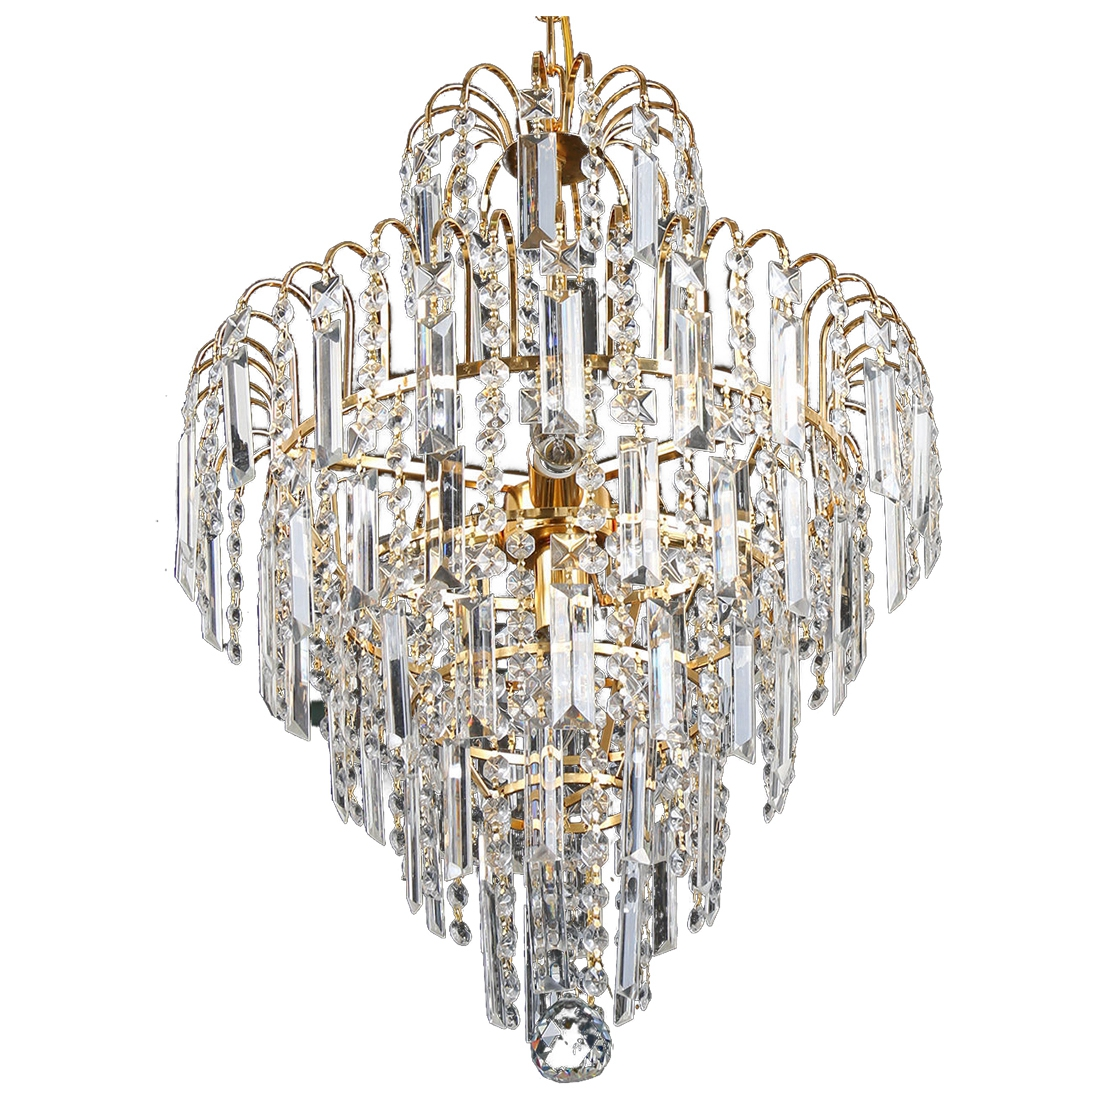 Luxury Big Crystal  Modern Lamp Pendant Lighting Fixture luxury big crystal modern ceiling light lamp lighting fixture